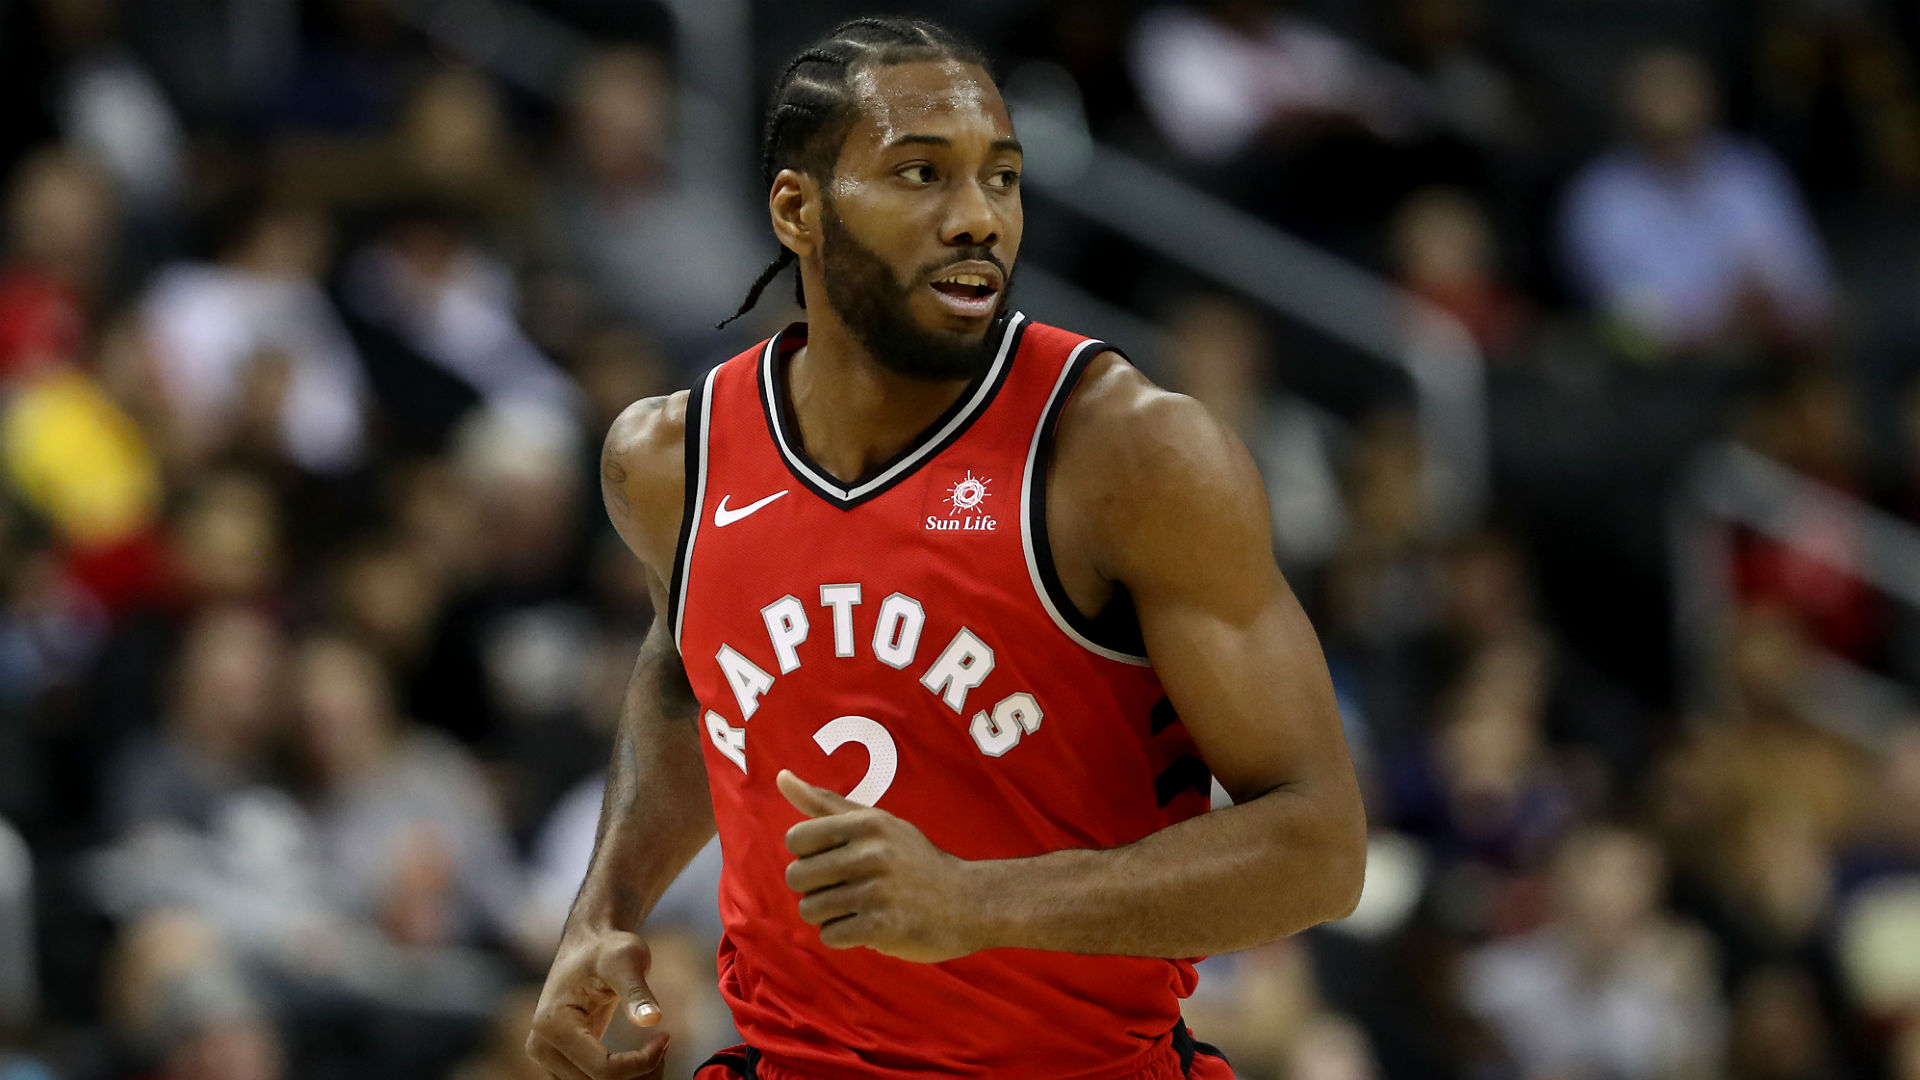 NBA rumors: Leonard considering re-signing with Raptors | Sporting News